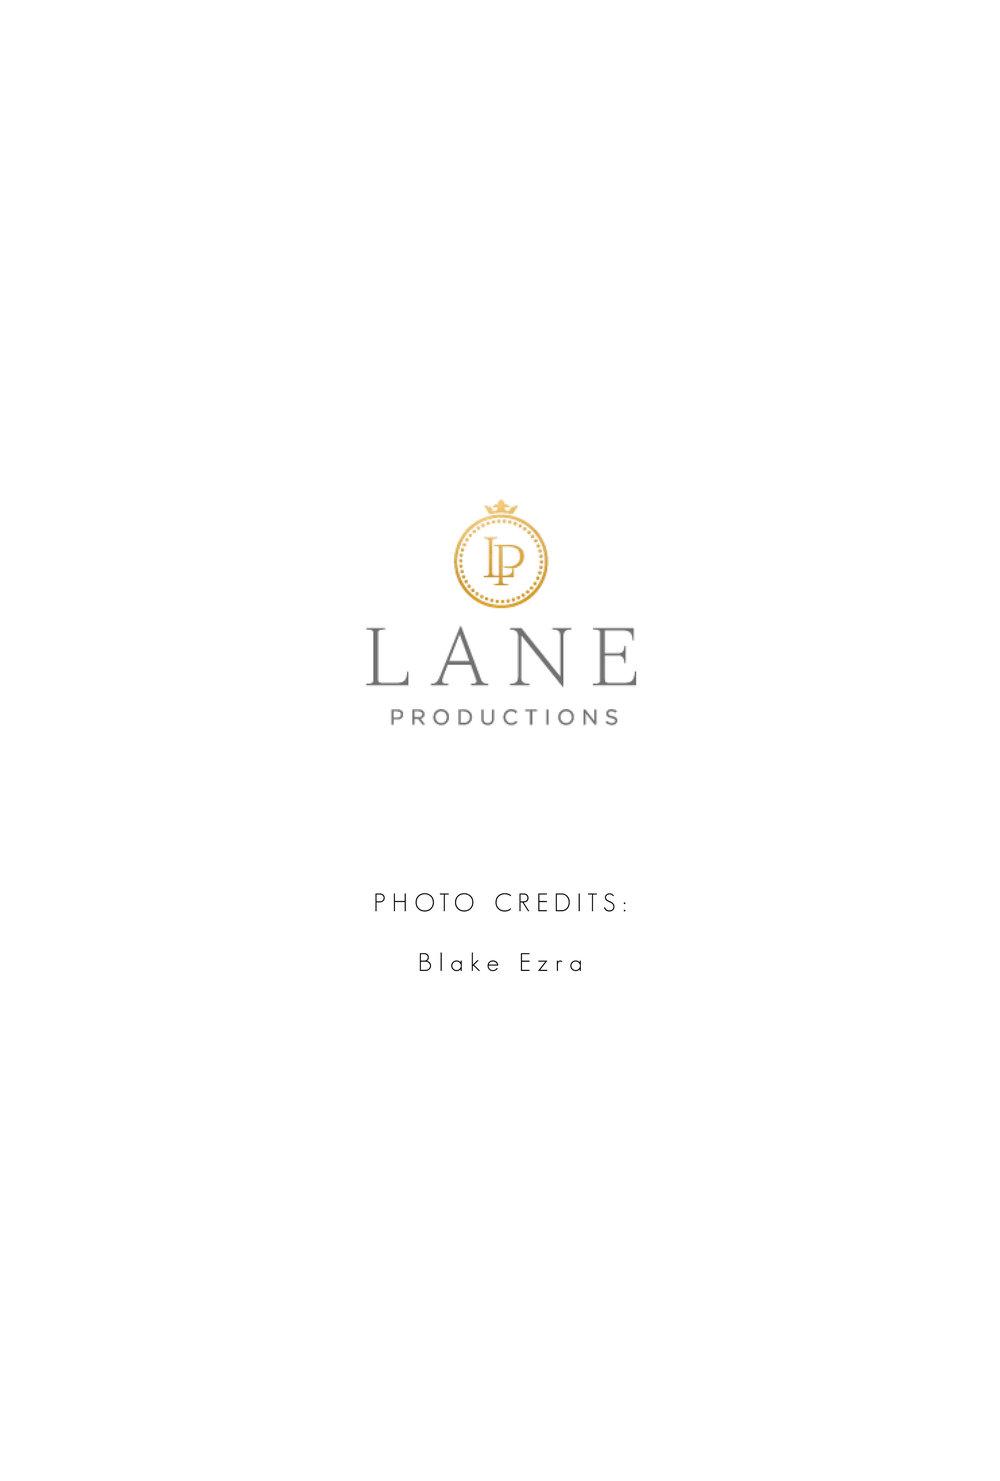 Blake Ezra LP Photo Credits Billie Media Mallorca Photographer Lane Productions .jpg